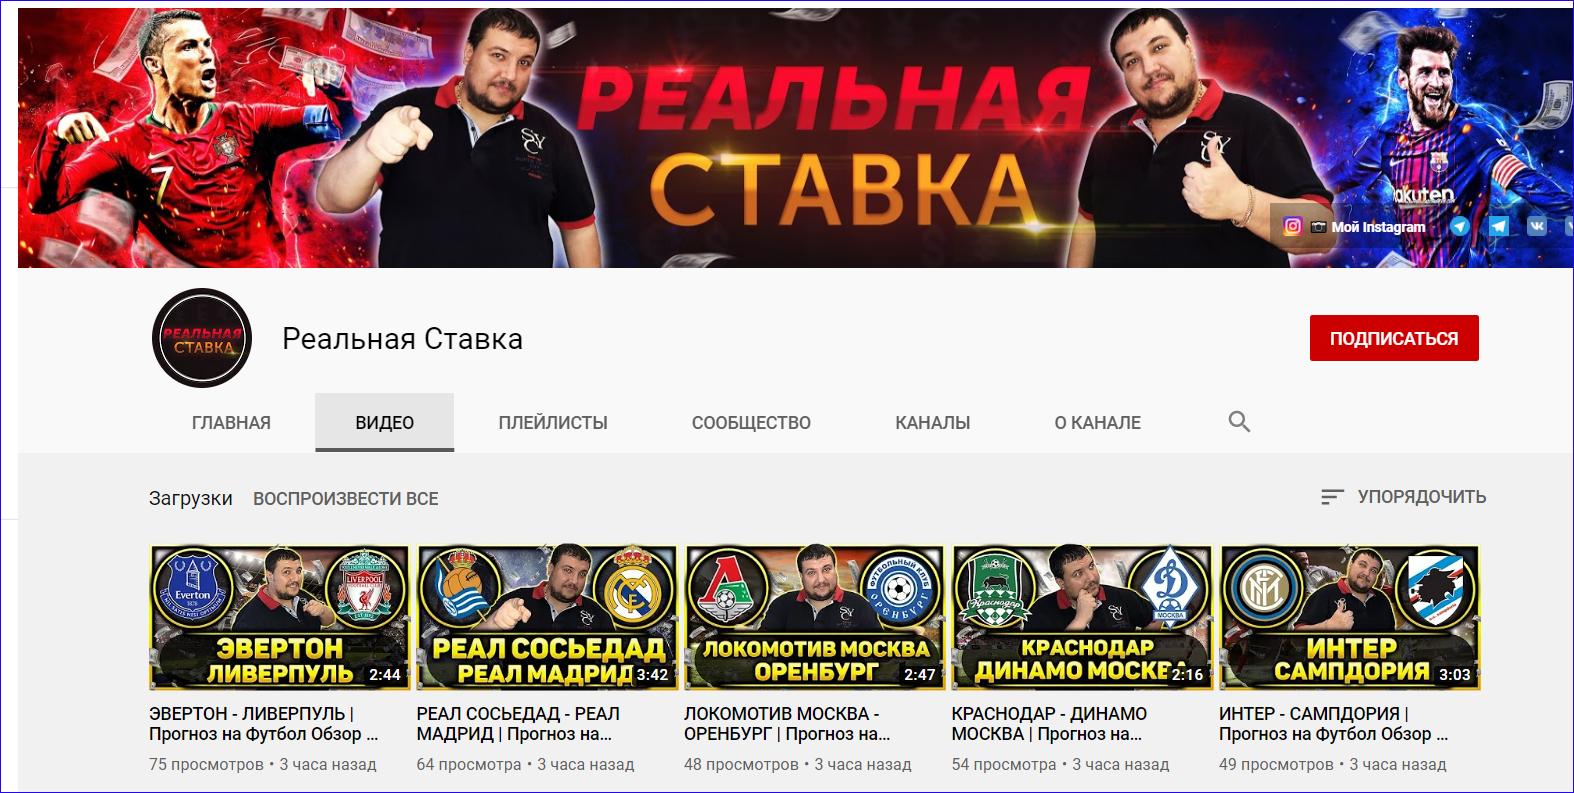 Youtube-канал Мурада